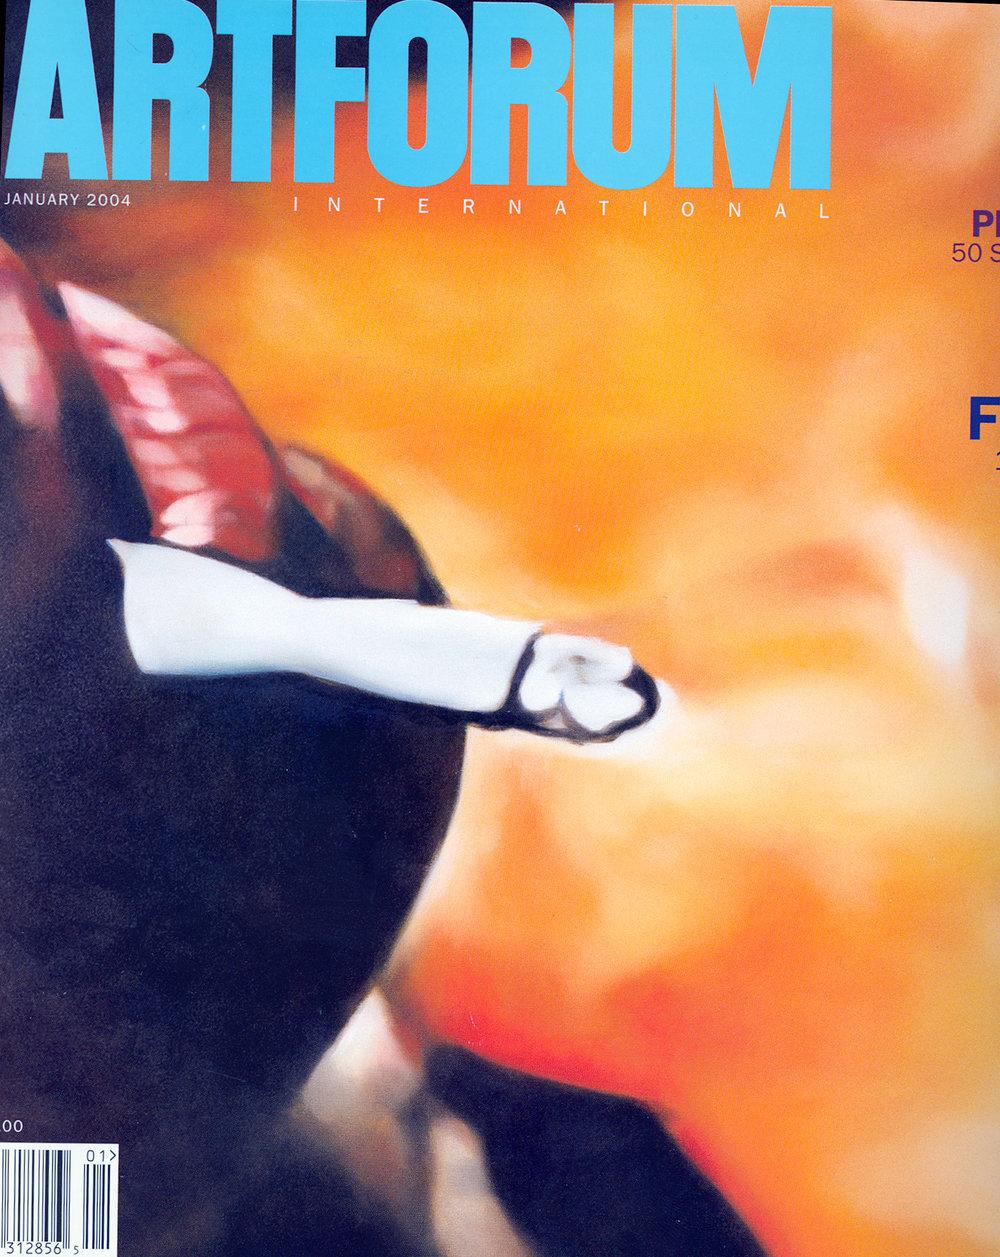 04 Artforum(couv).jpg